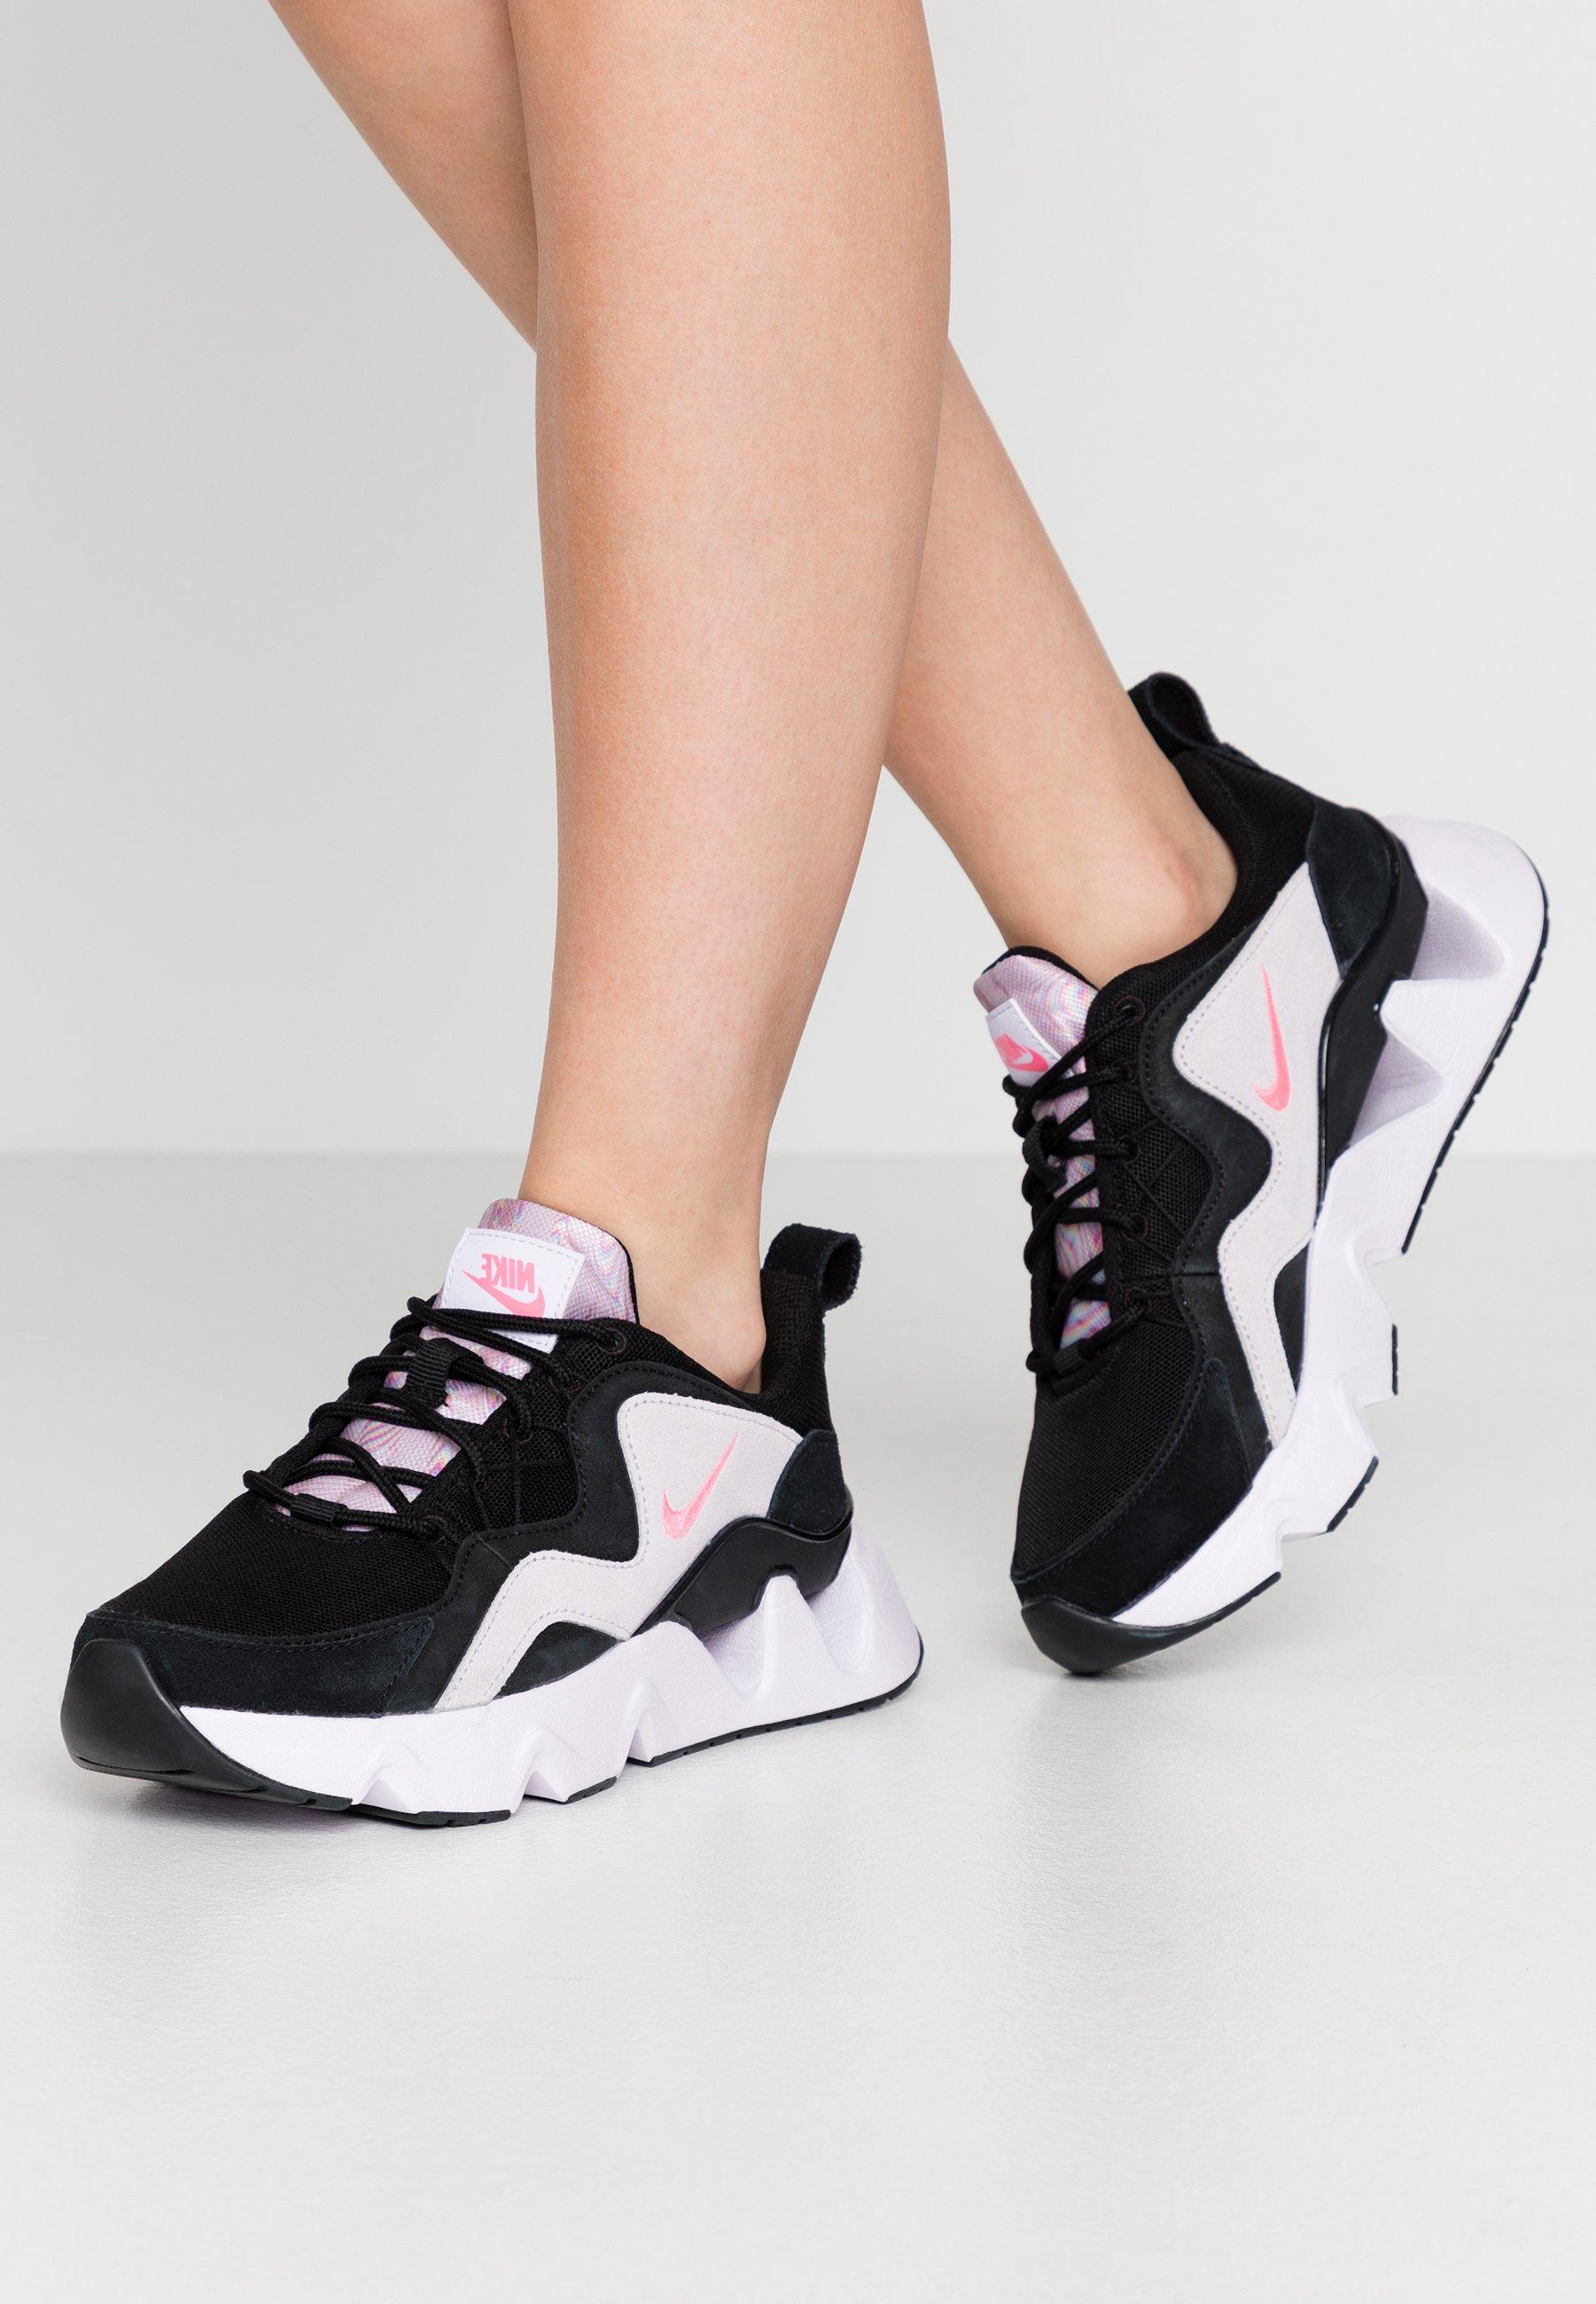 nike sportswear ryz zapatillas